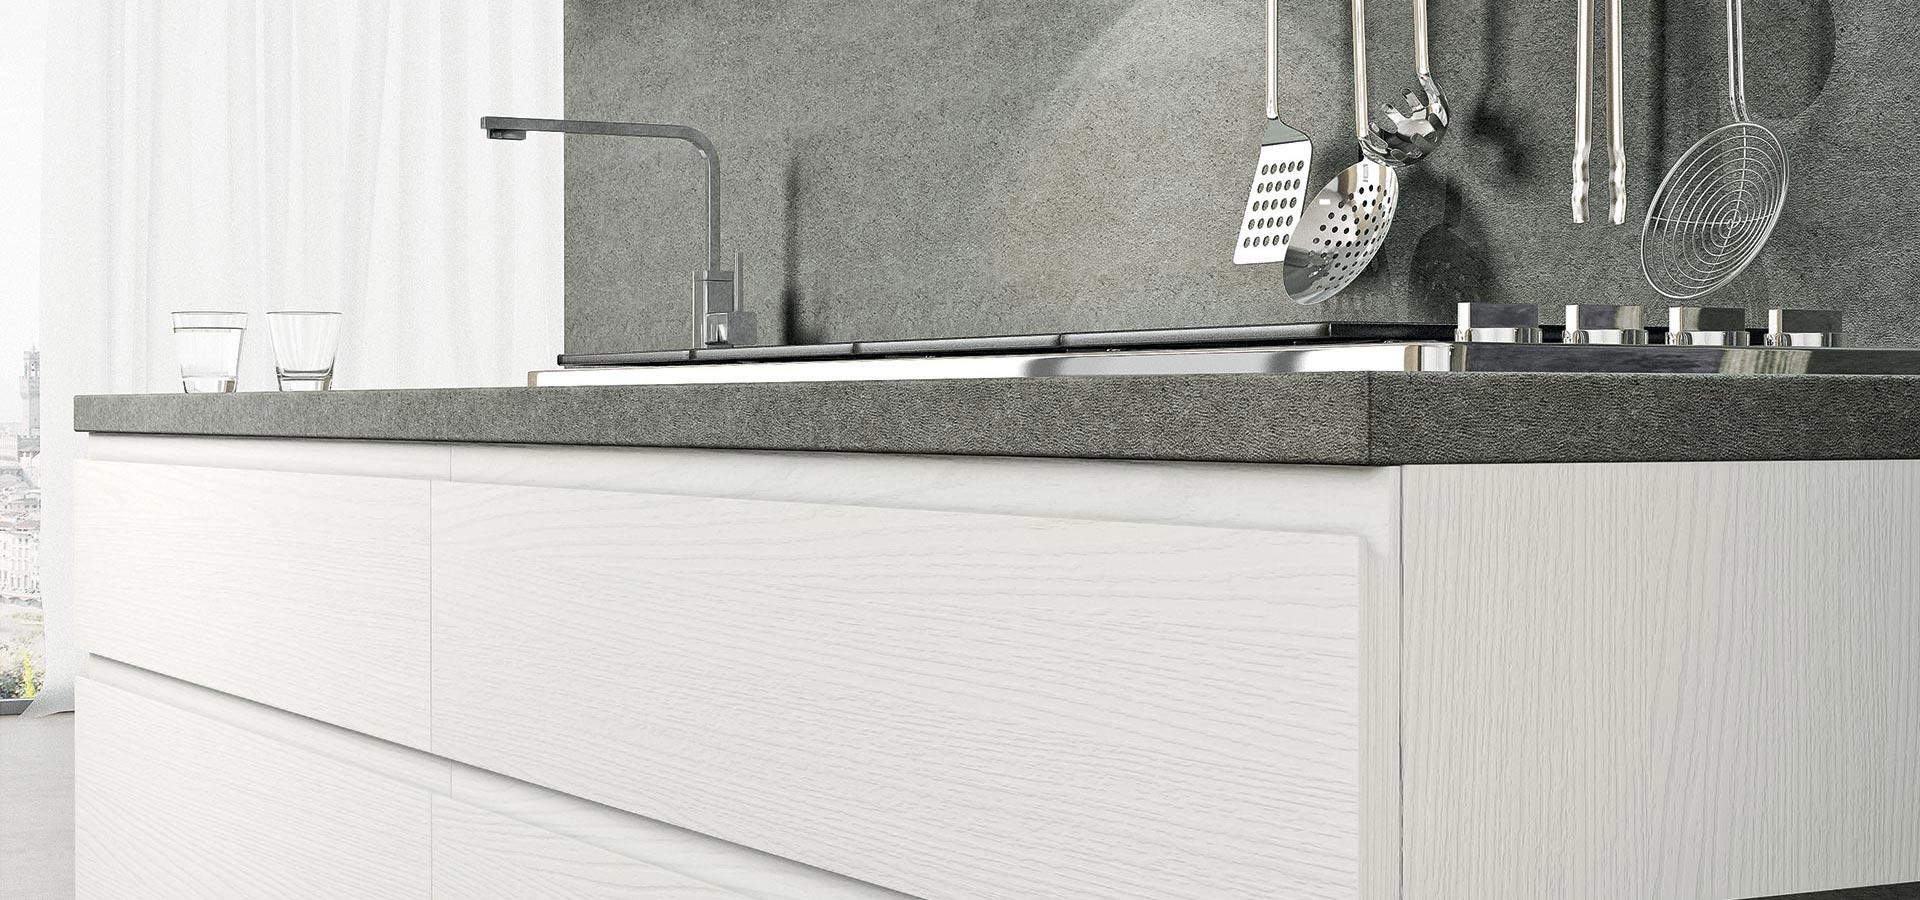 Cucina senza maniglia: belle, pratiche e di tendenza - Blog - Design ...